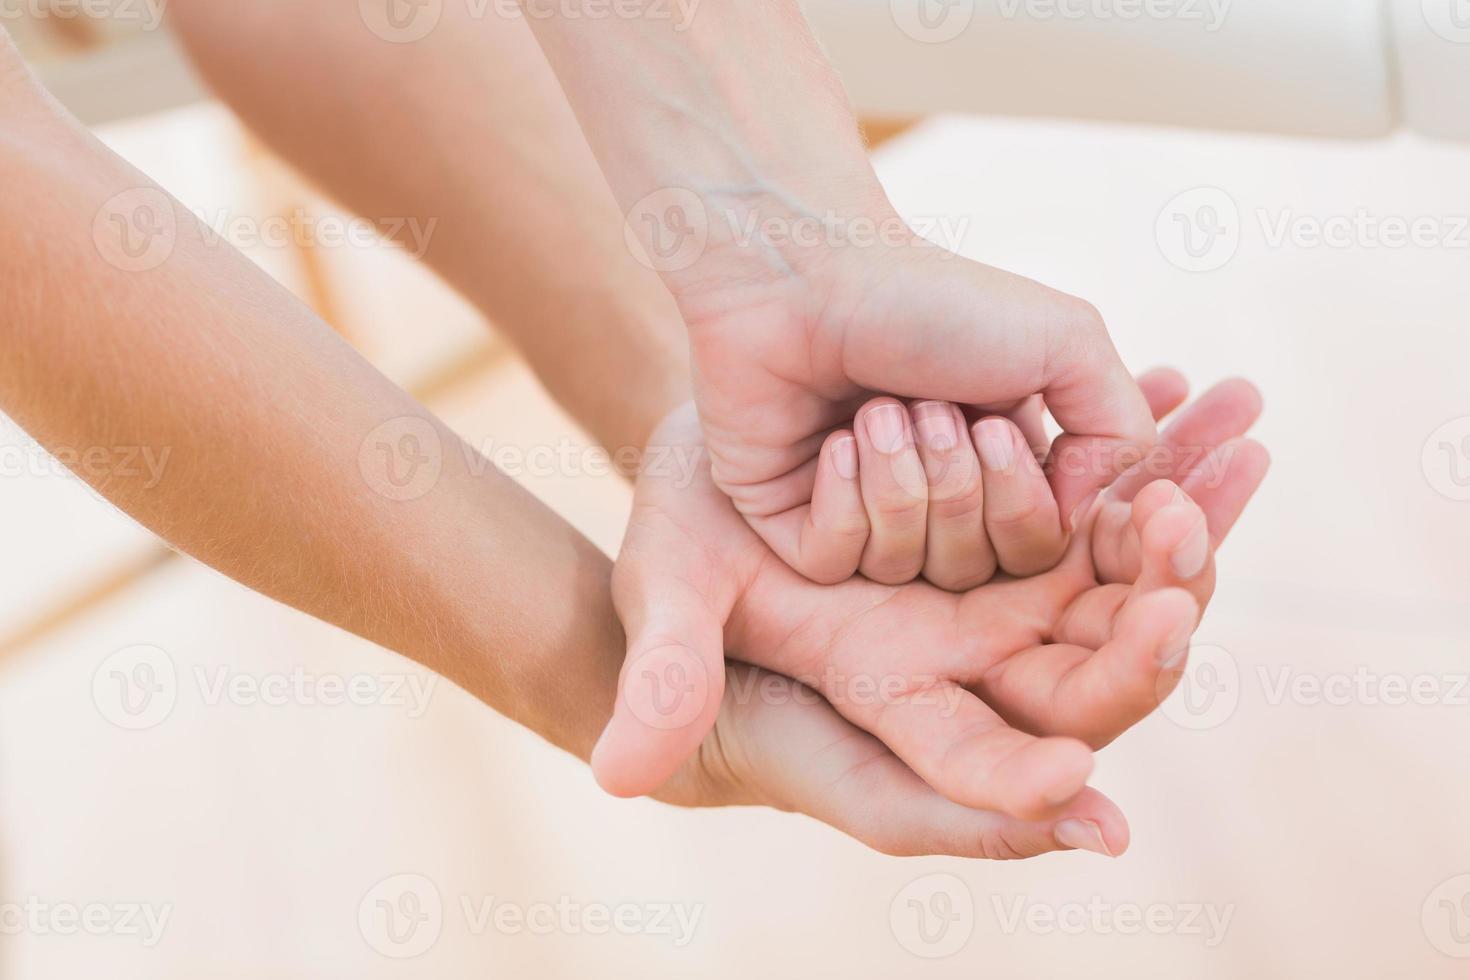 fysioterapeut som gör handmassage foto